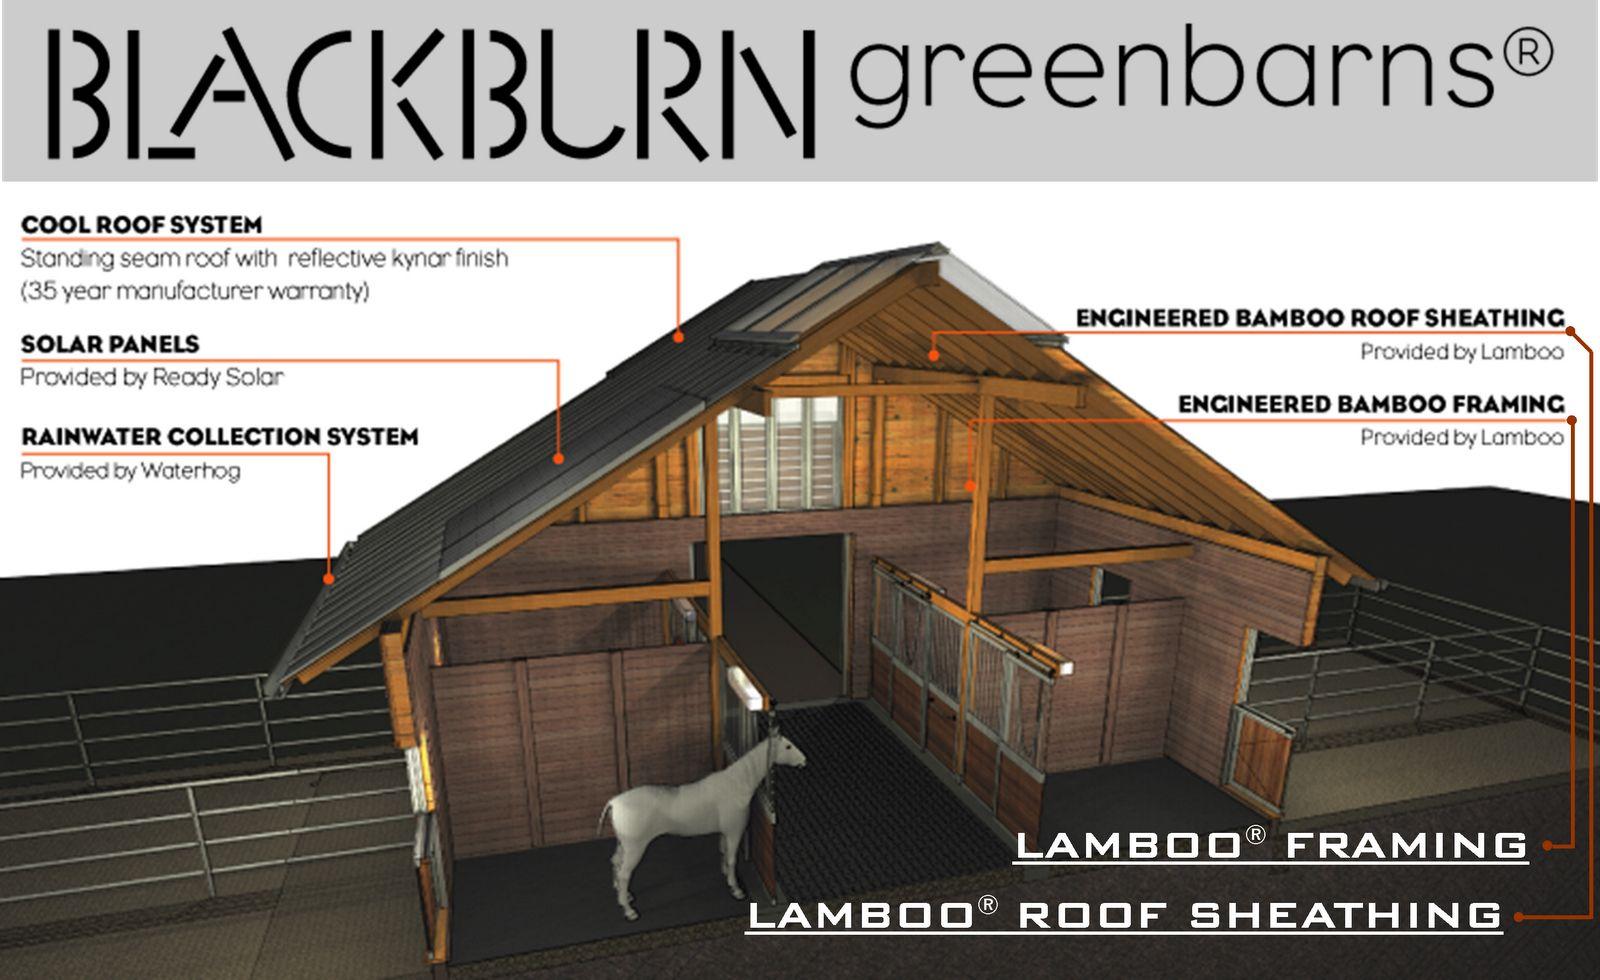 Blackburn Greenbarns